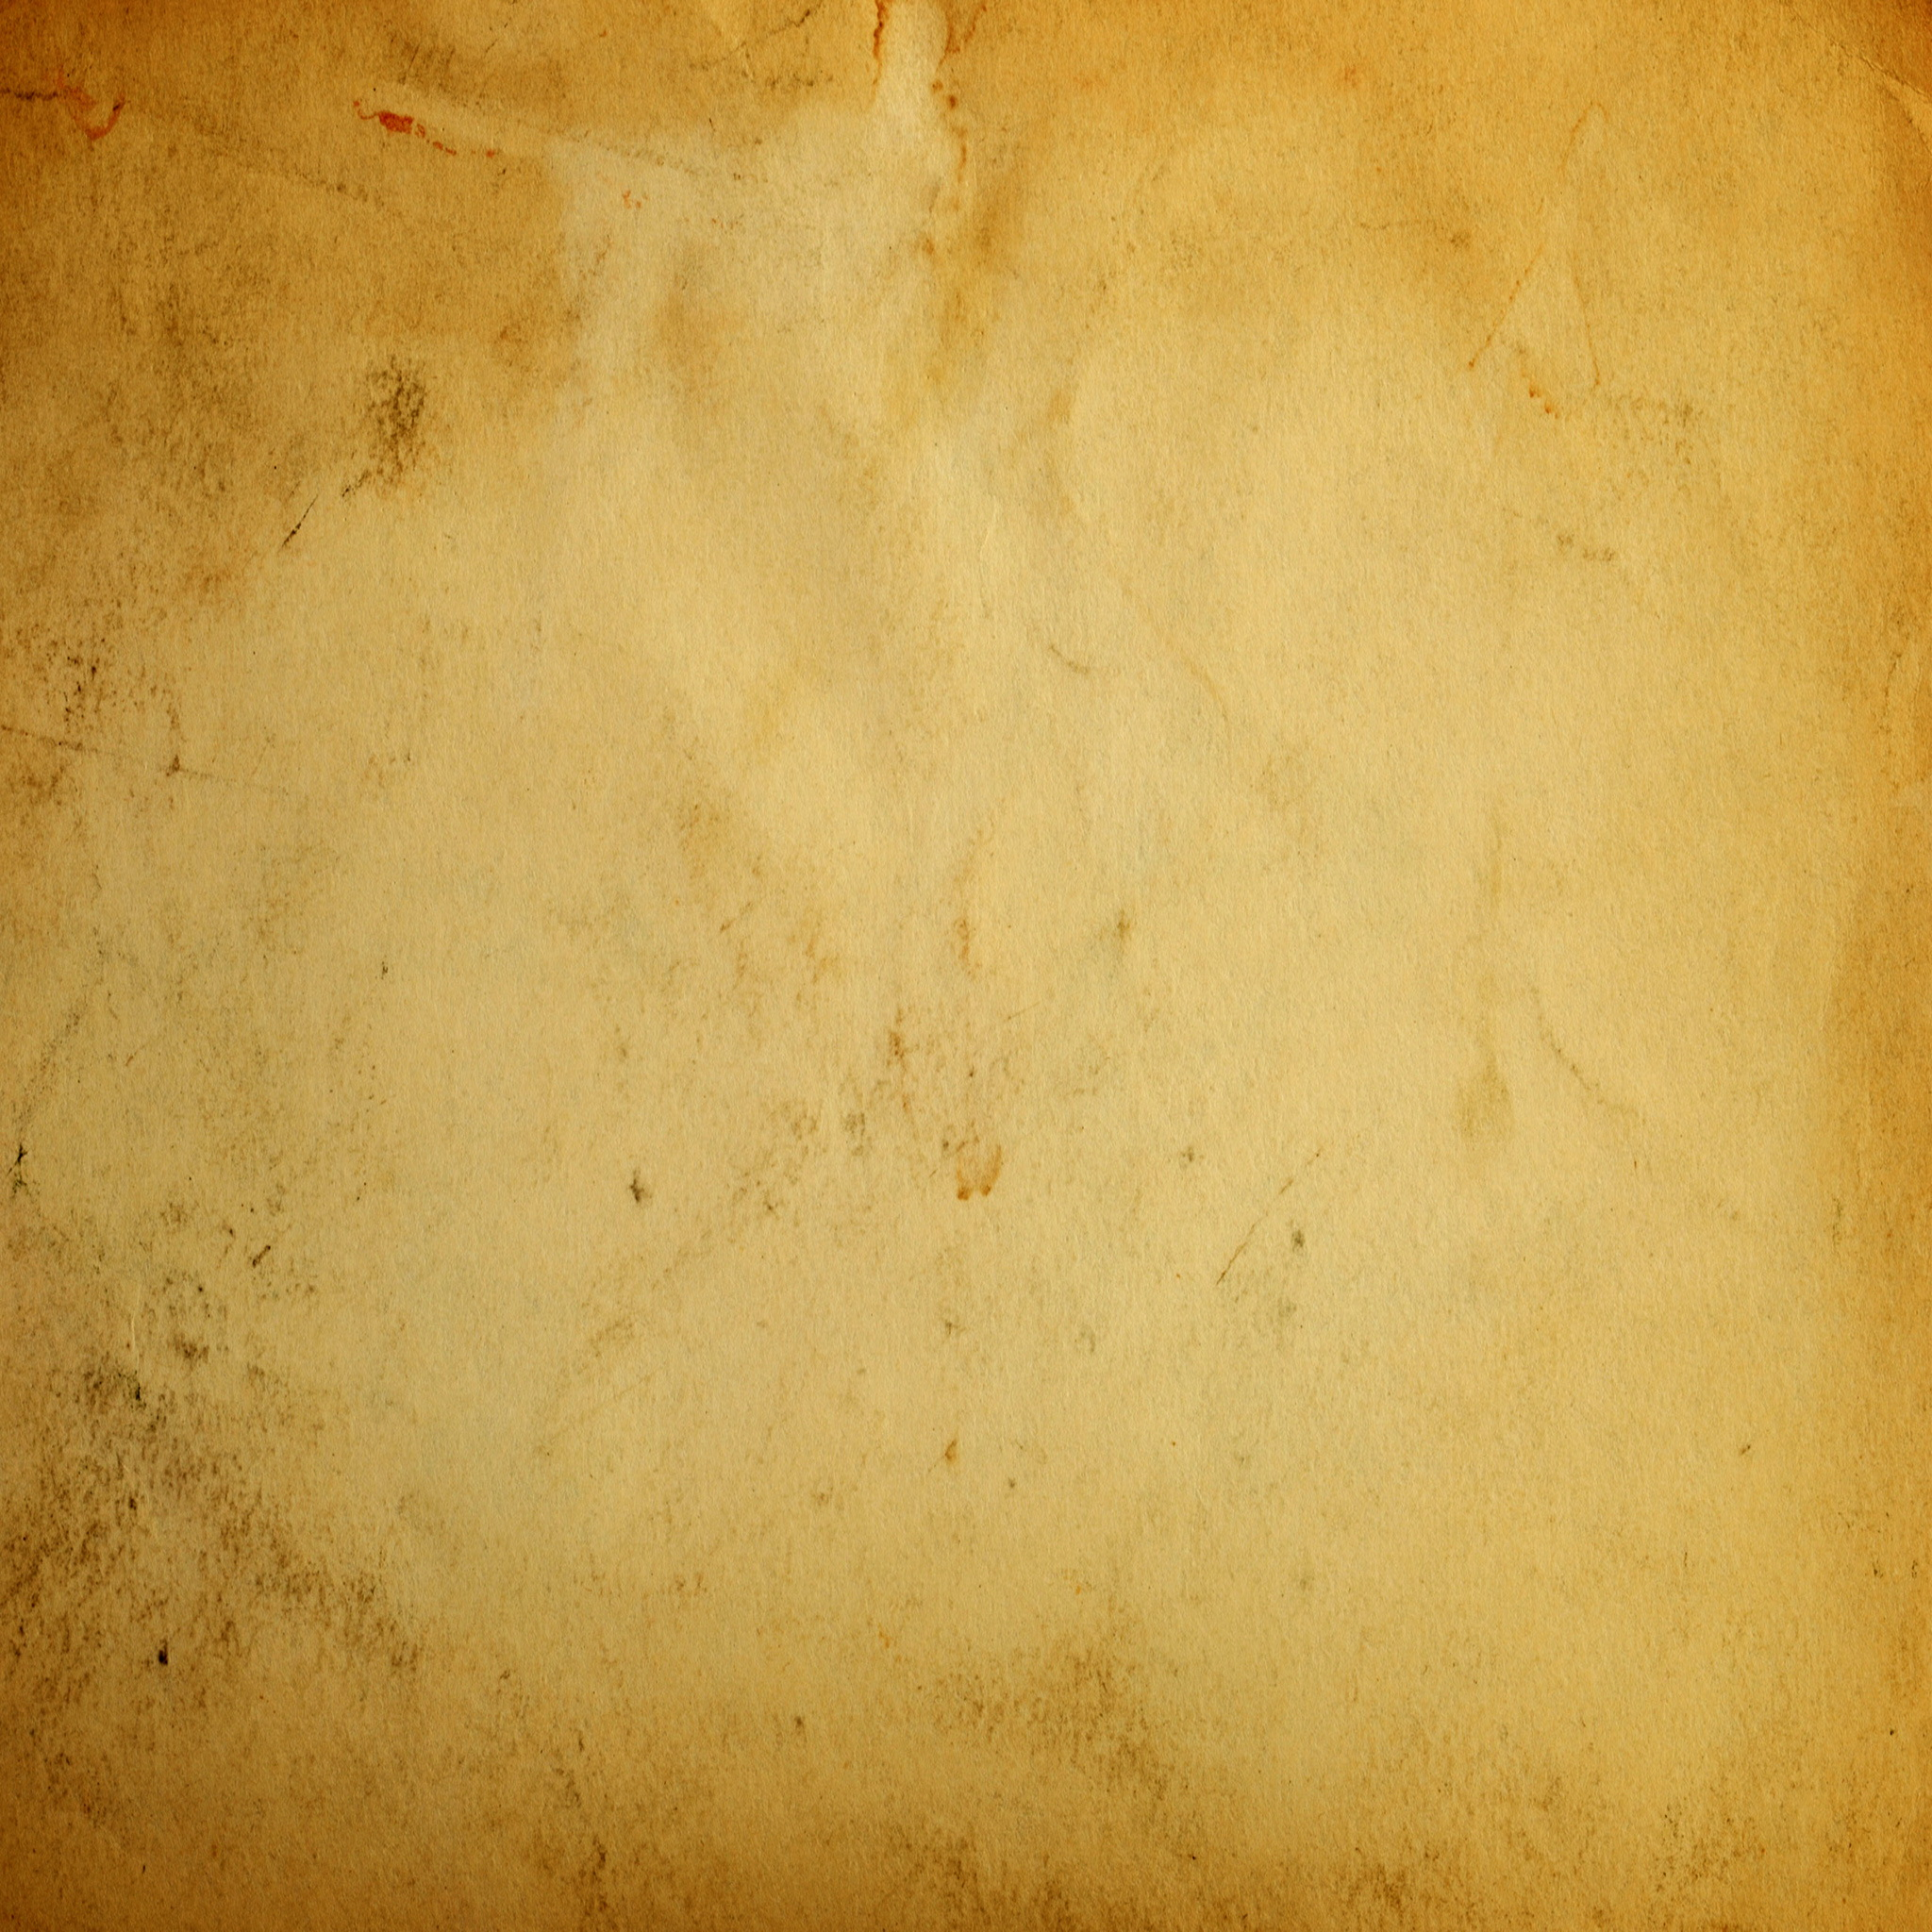 iPad Retina Wallpapers HD   Retina ready stunning wallpapers 2048x2048